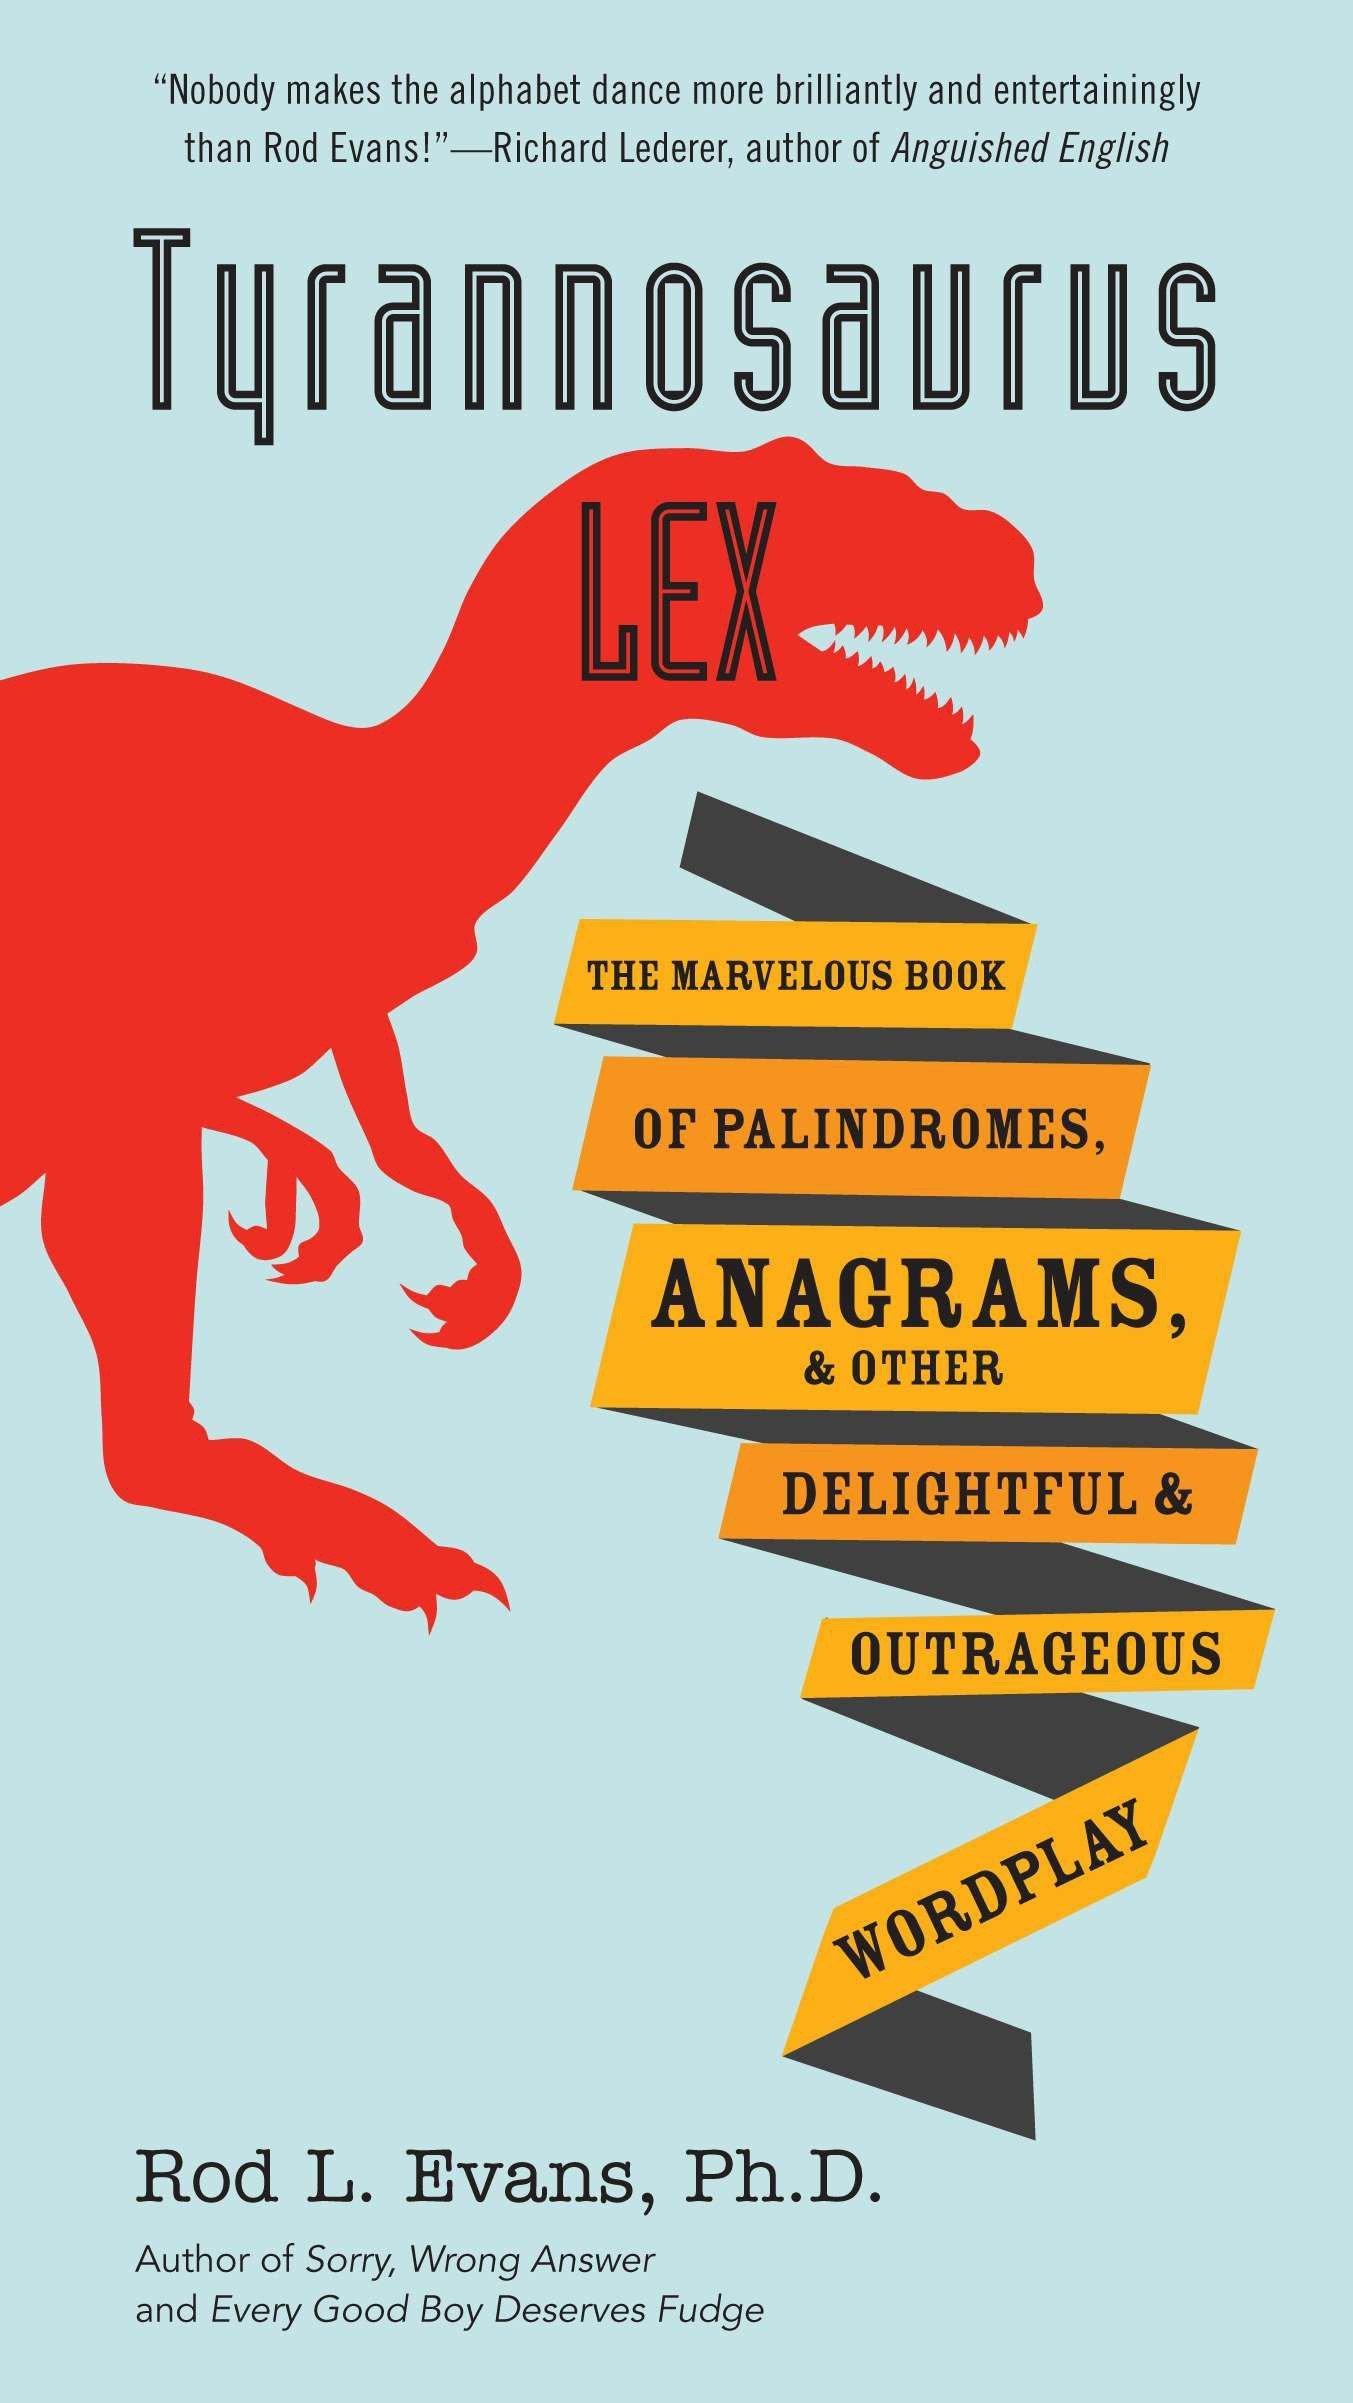 Amazon com: Tyrannosaurus Lex: The Marvelous Book of